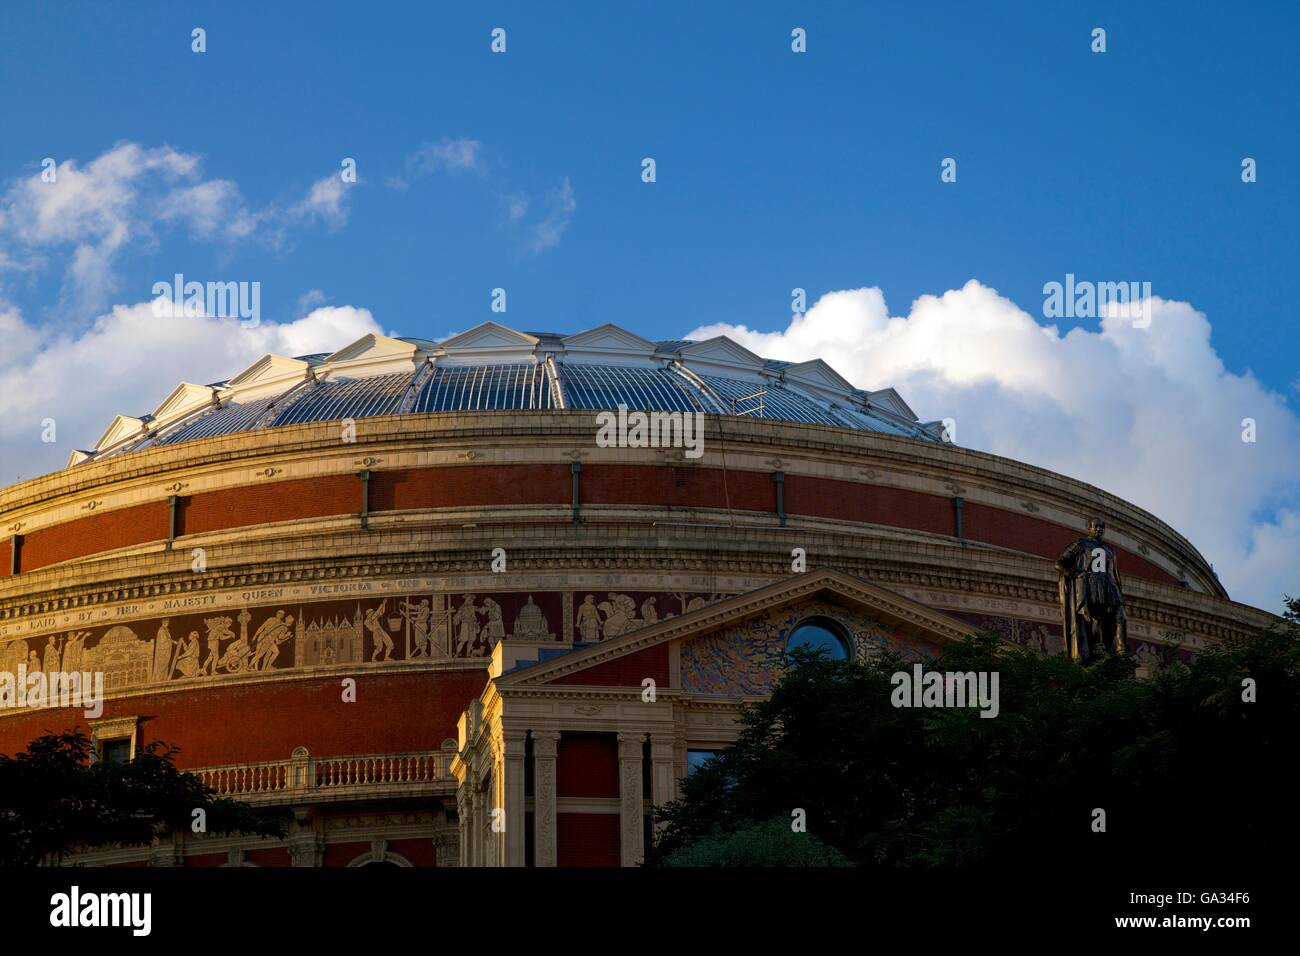 Exterior of Royal Albert Hall, Kensington, London, England, UK, GB - Stock Image